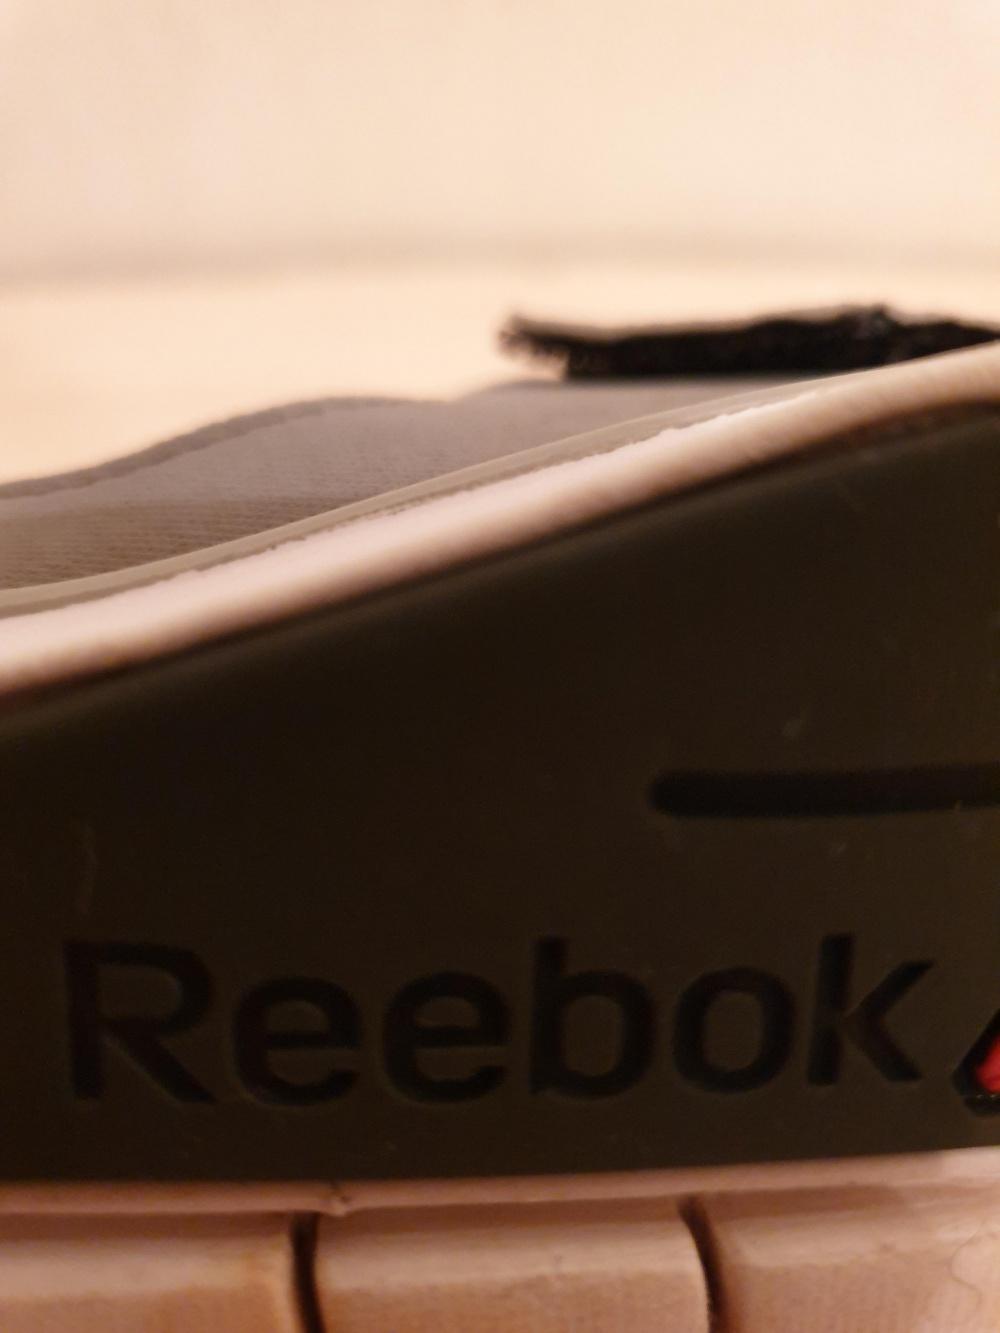 Кроссовки ф-ма Reebok 42 размера